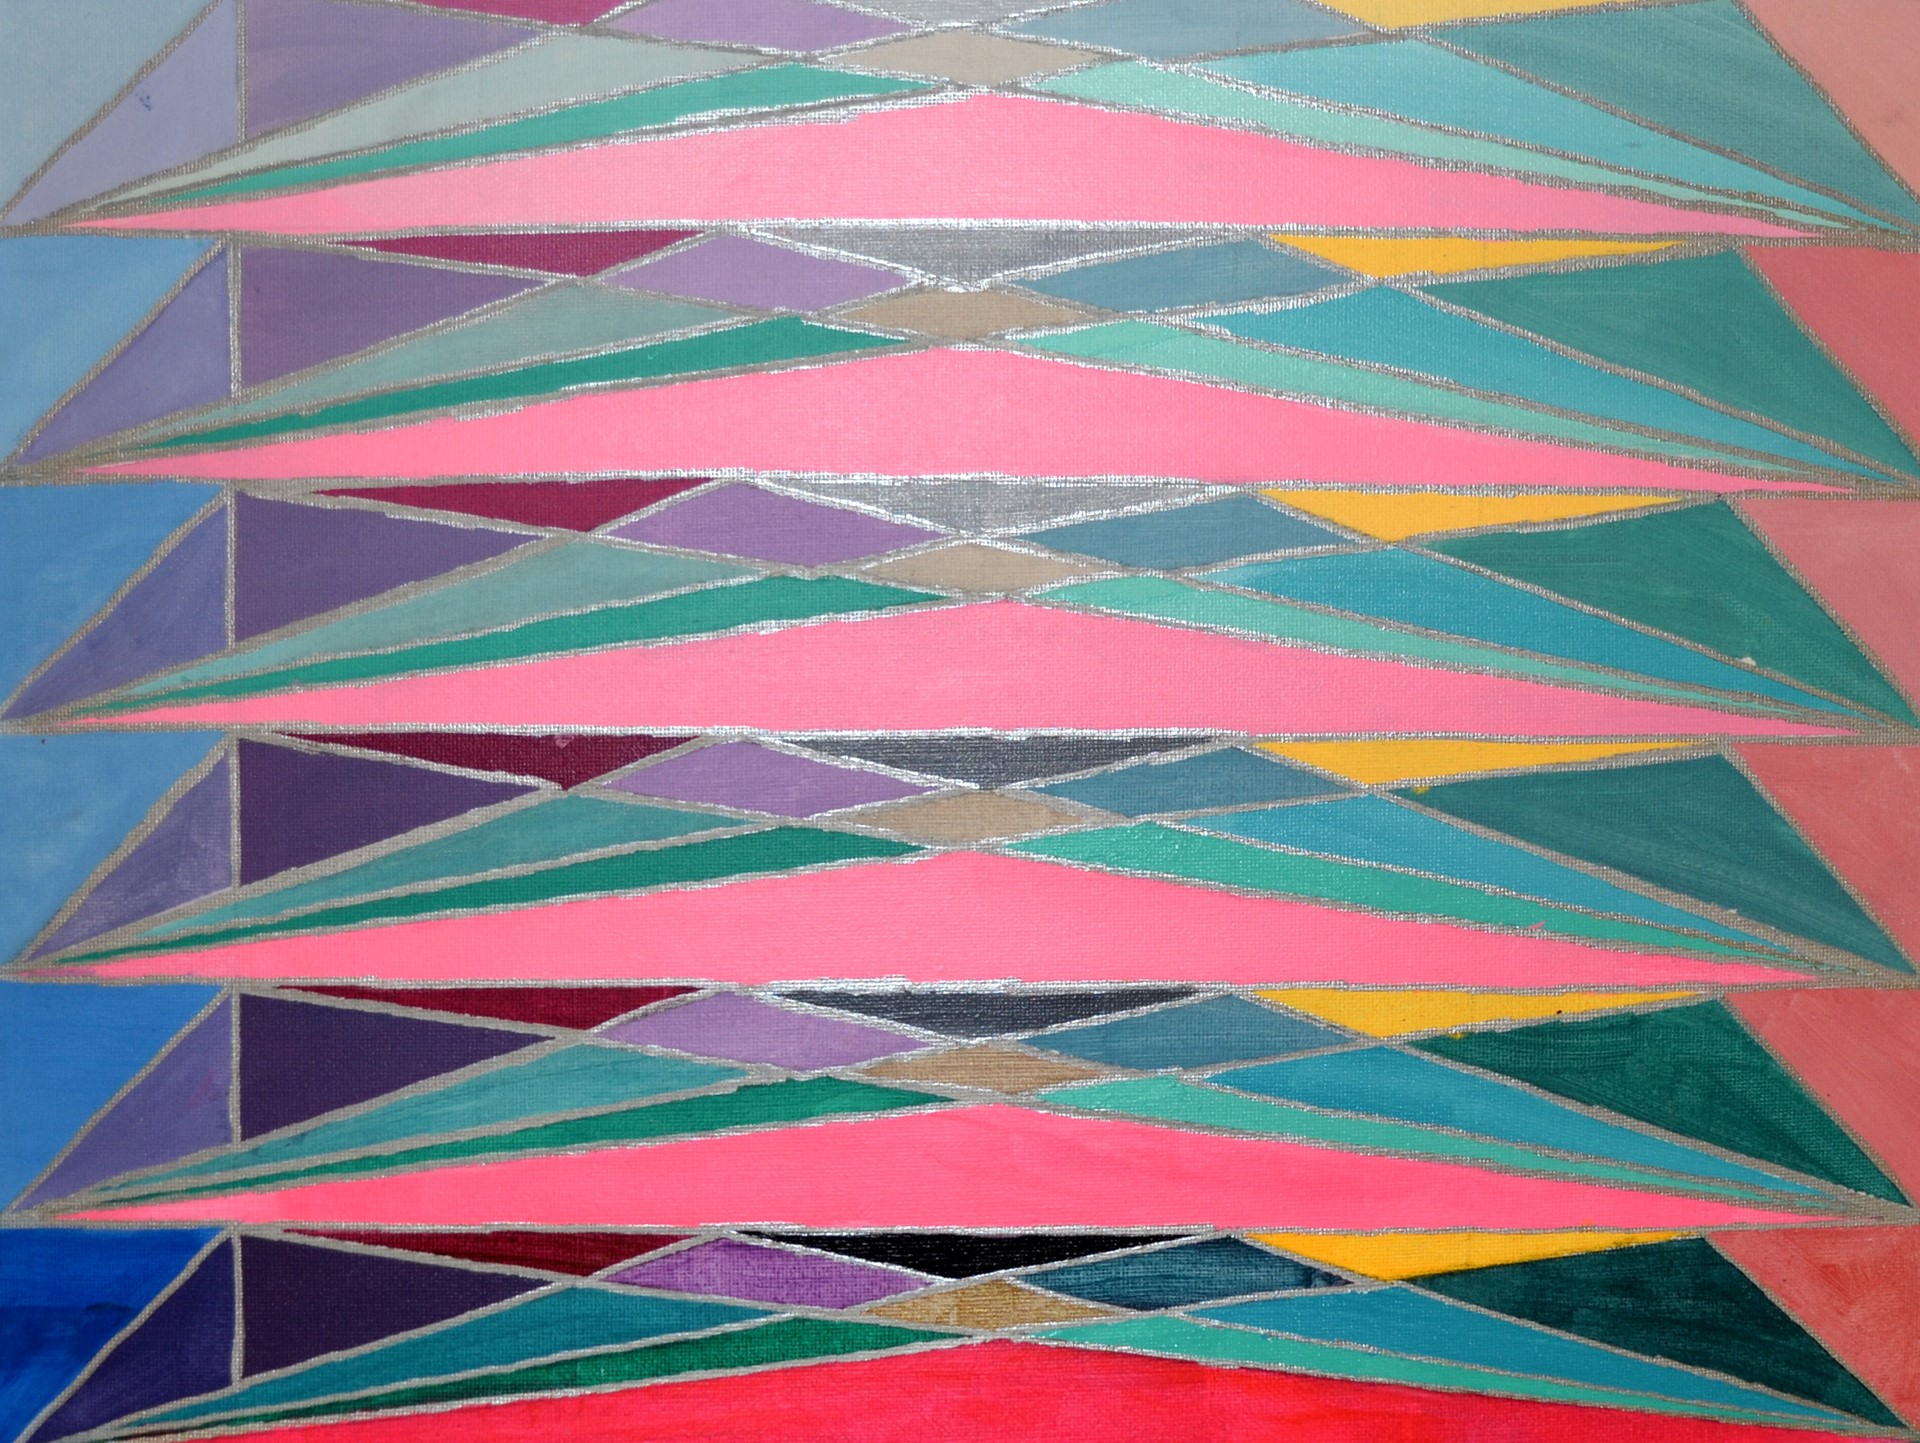 Dakota Cotton, Triangular Triangles, acrylic on canvas board 12 x 16, 2016